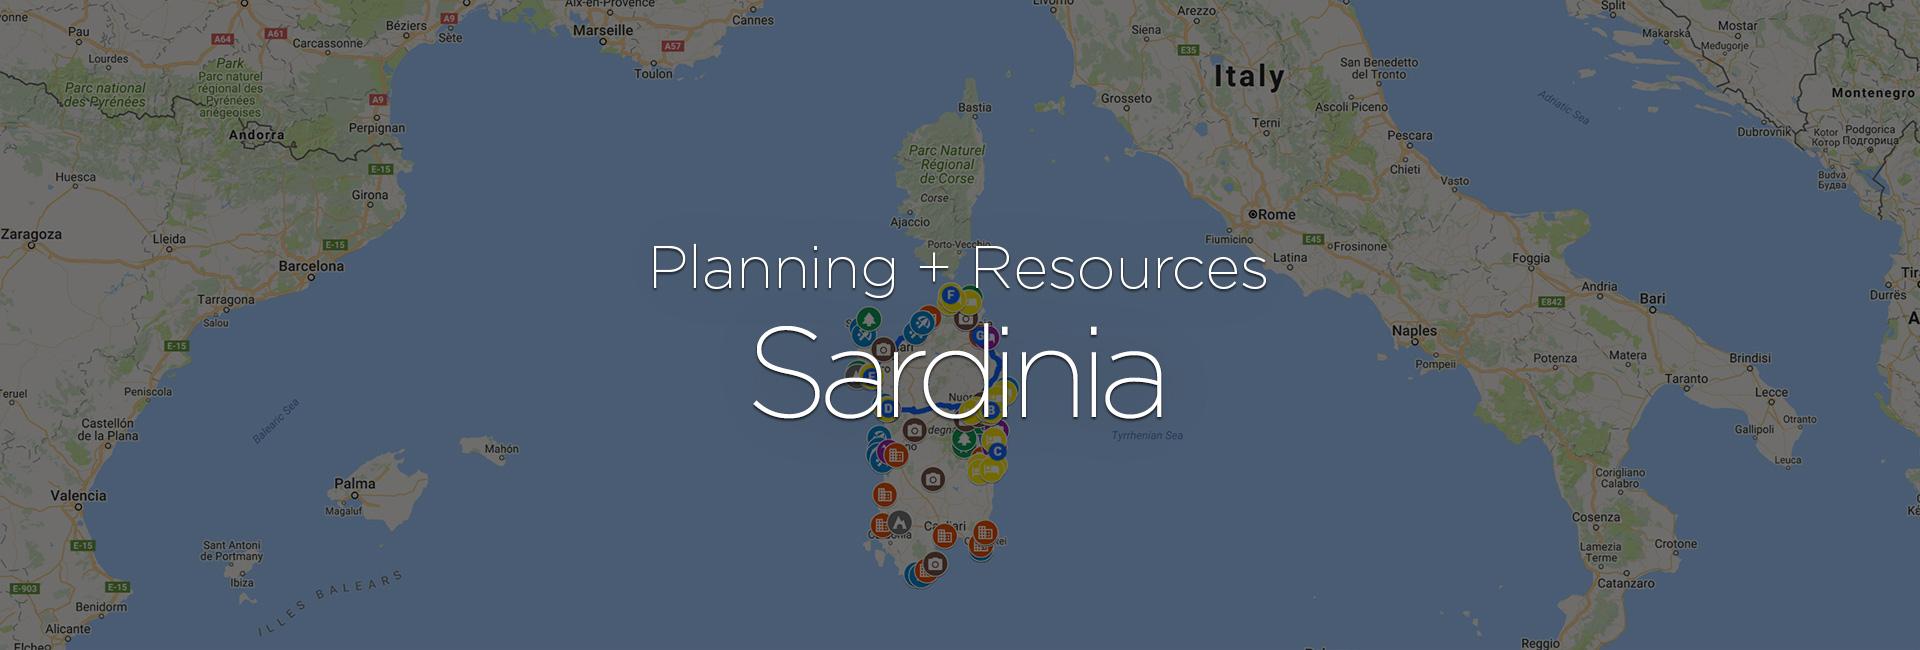 Planning + Resources: Sardinia